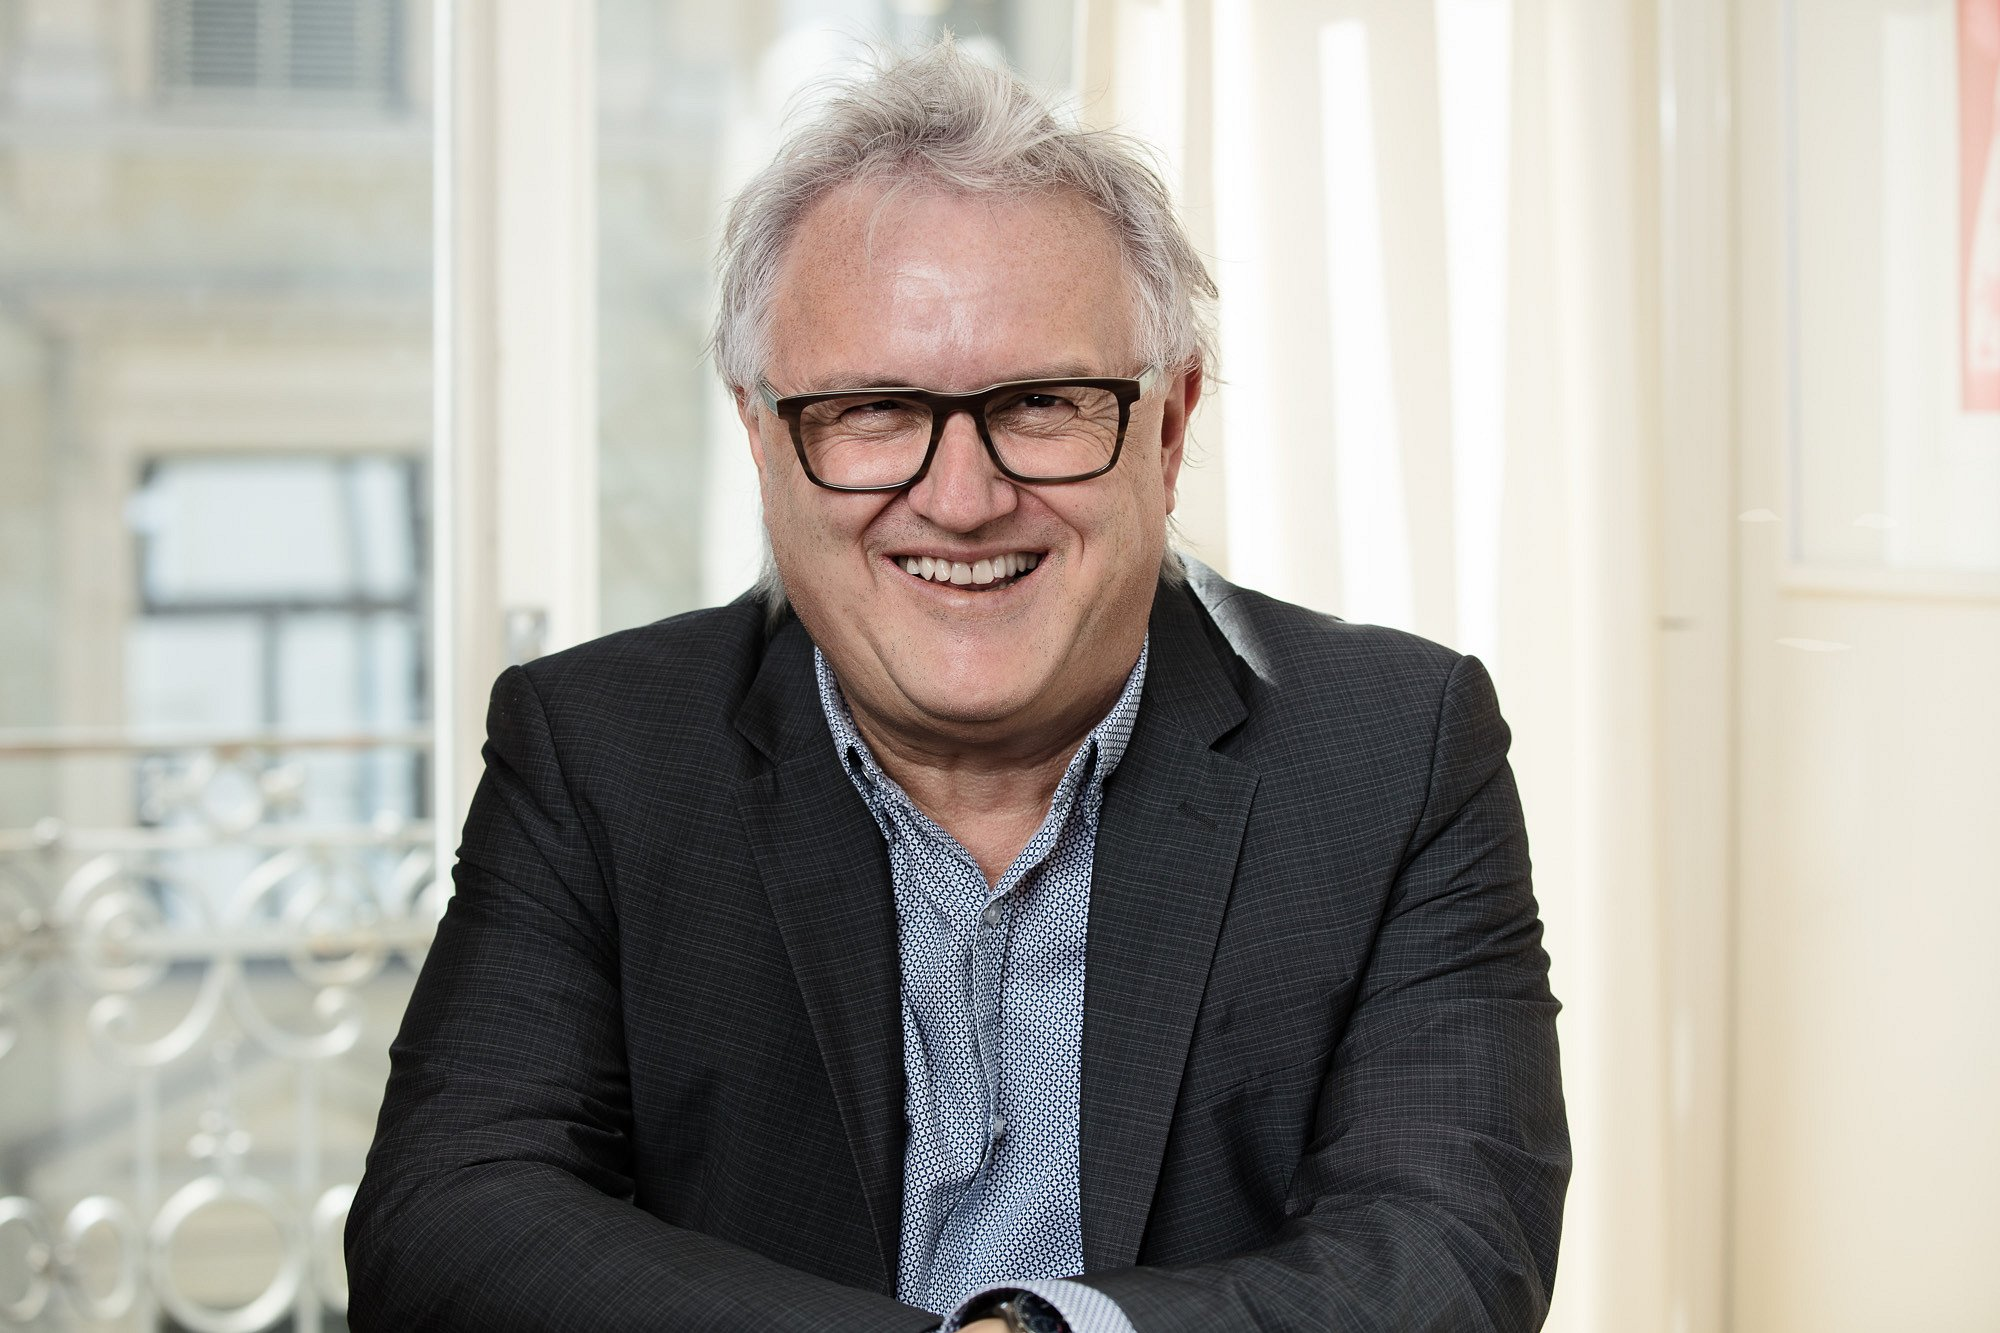 Markus Fäh